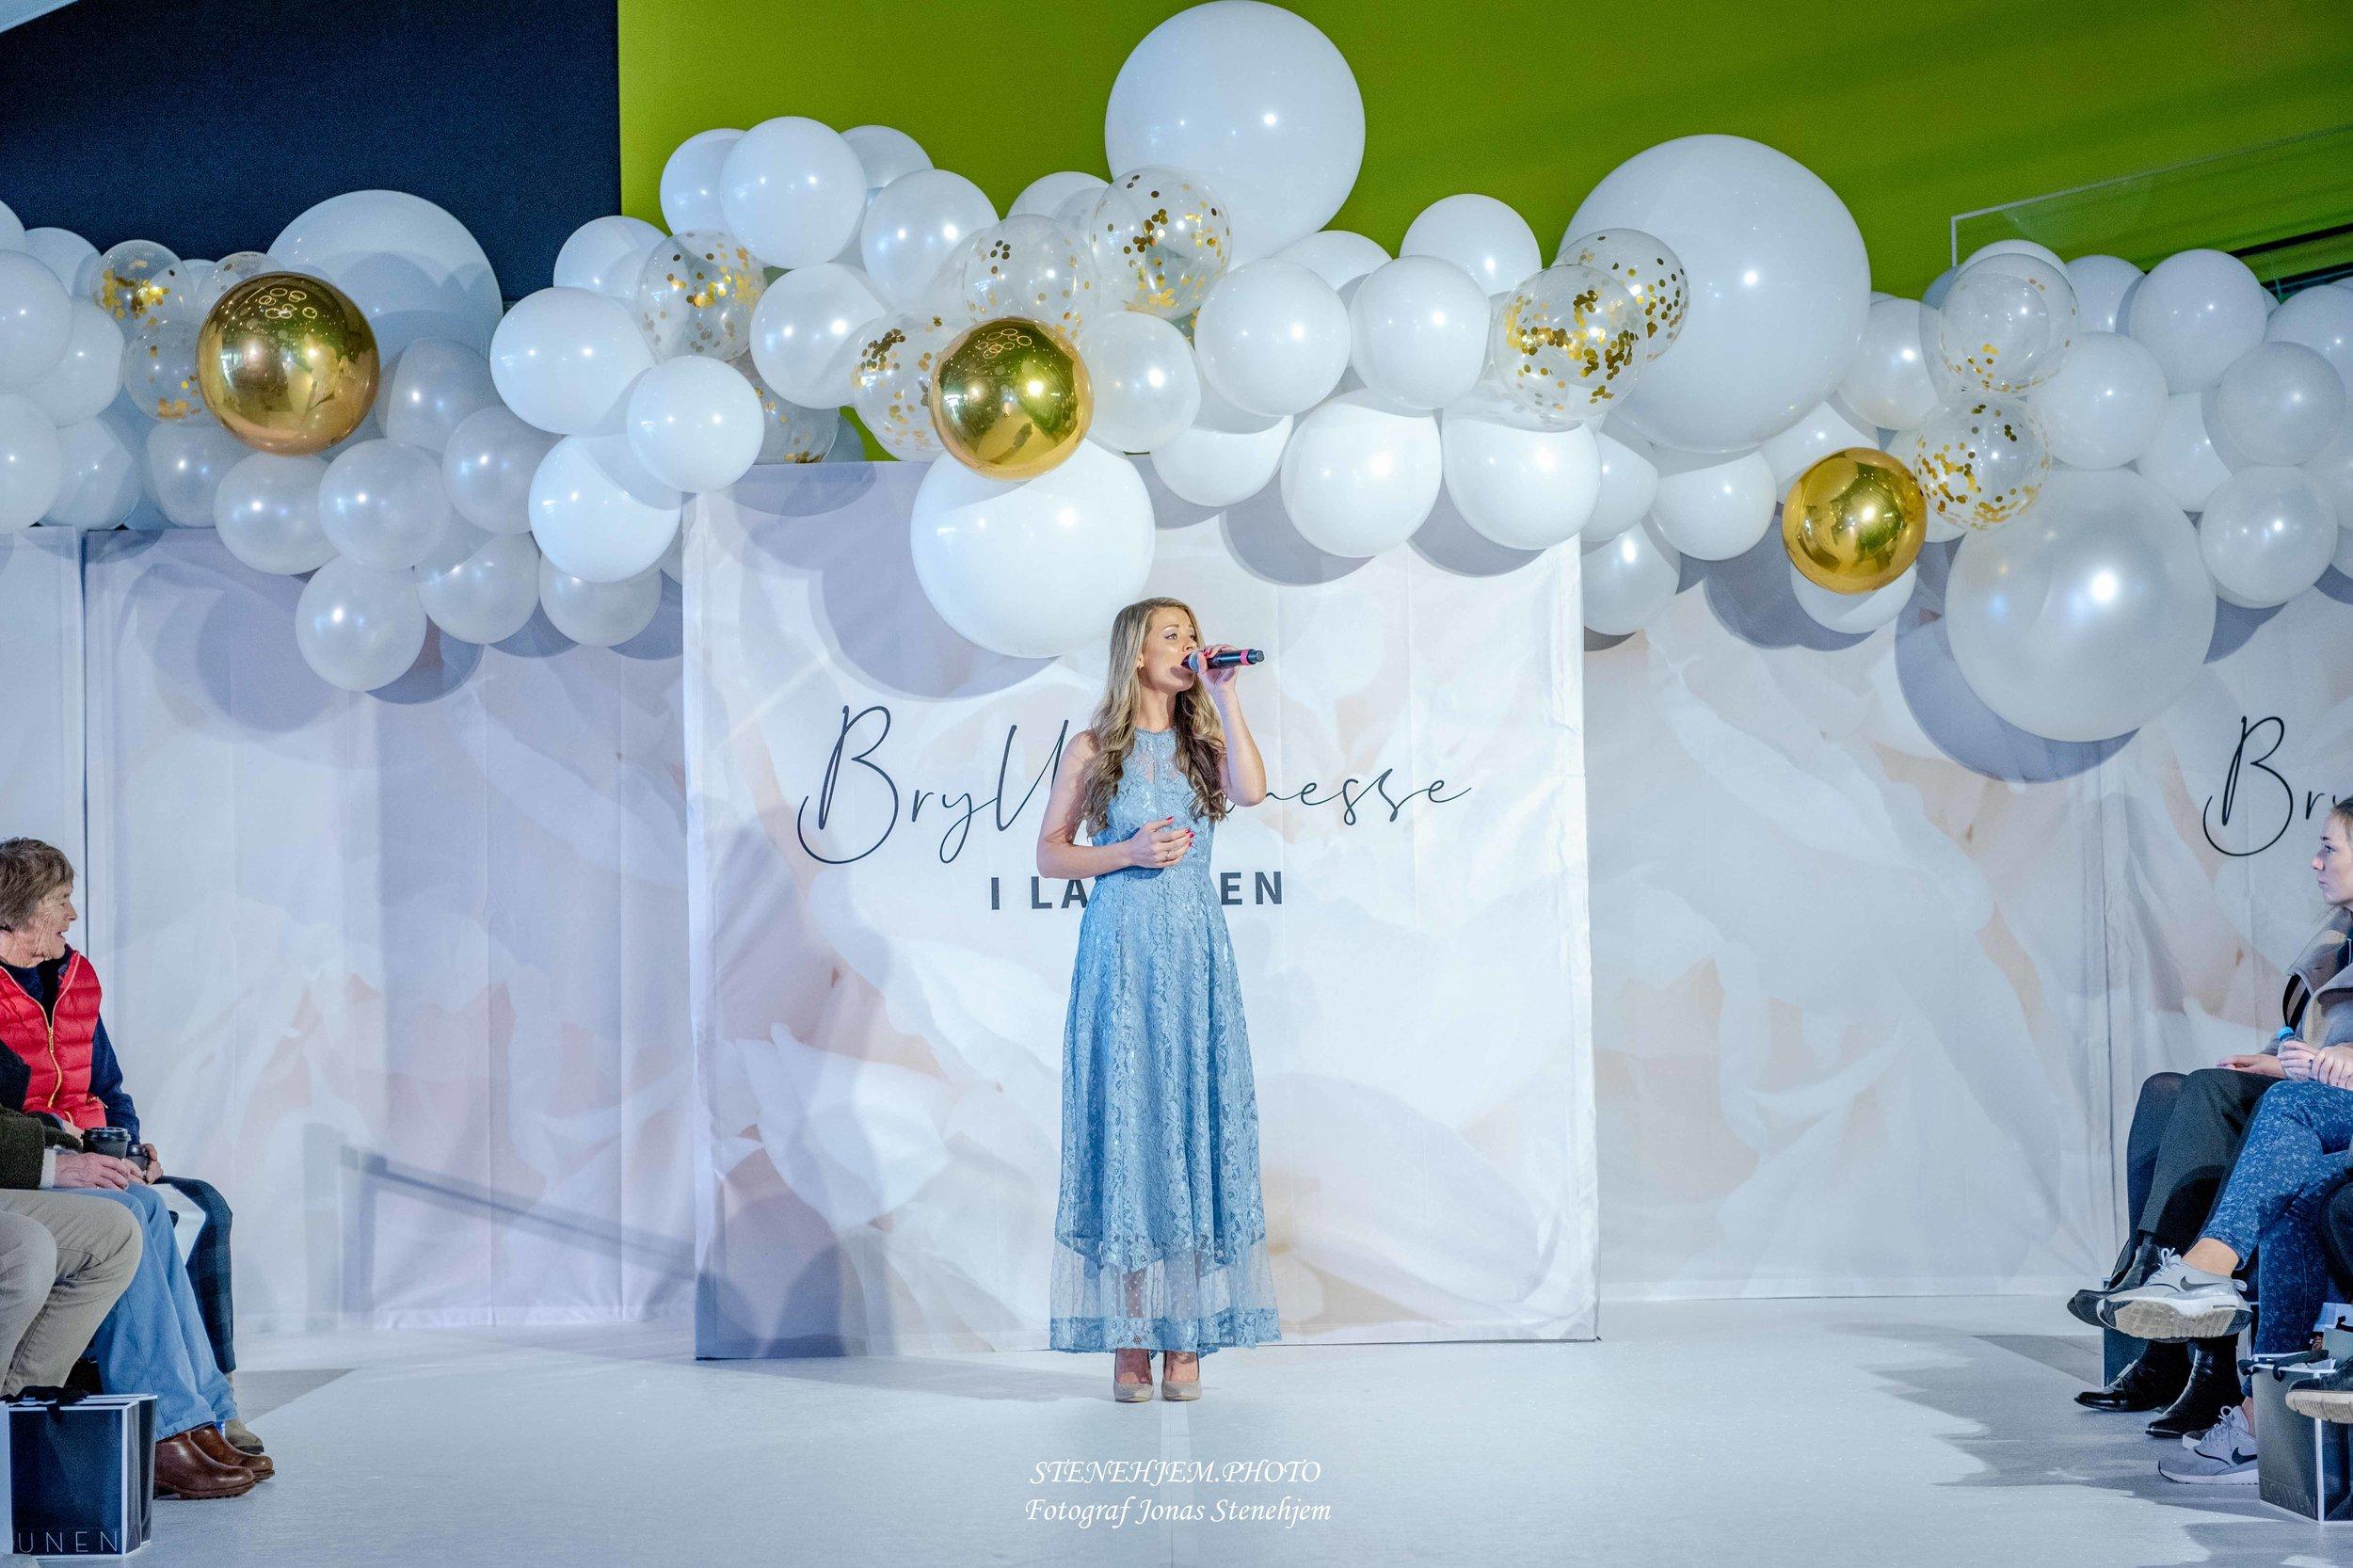 Bryllupsmesse_Lagunen_mittaltweddingfair__039.jpg